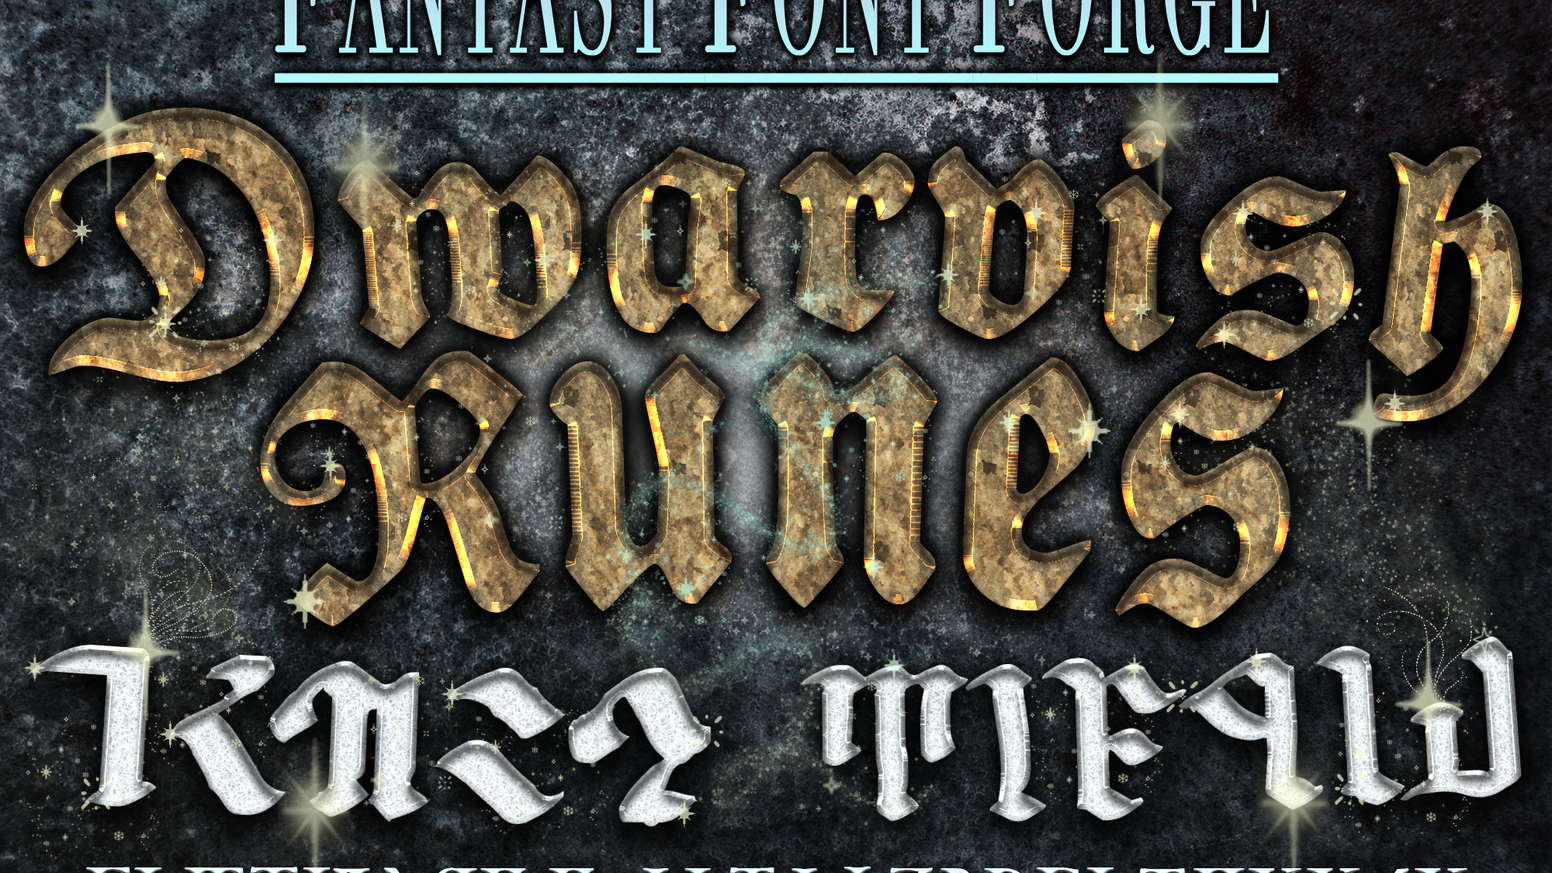 Fantasy Font Forge: Dwarvish Runes by Infinity Plus One — Kickstarter